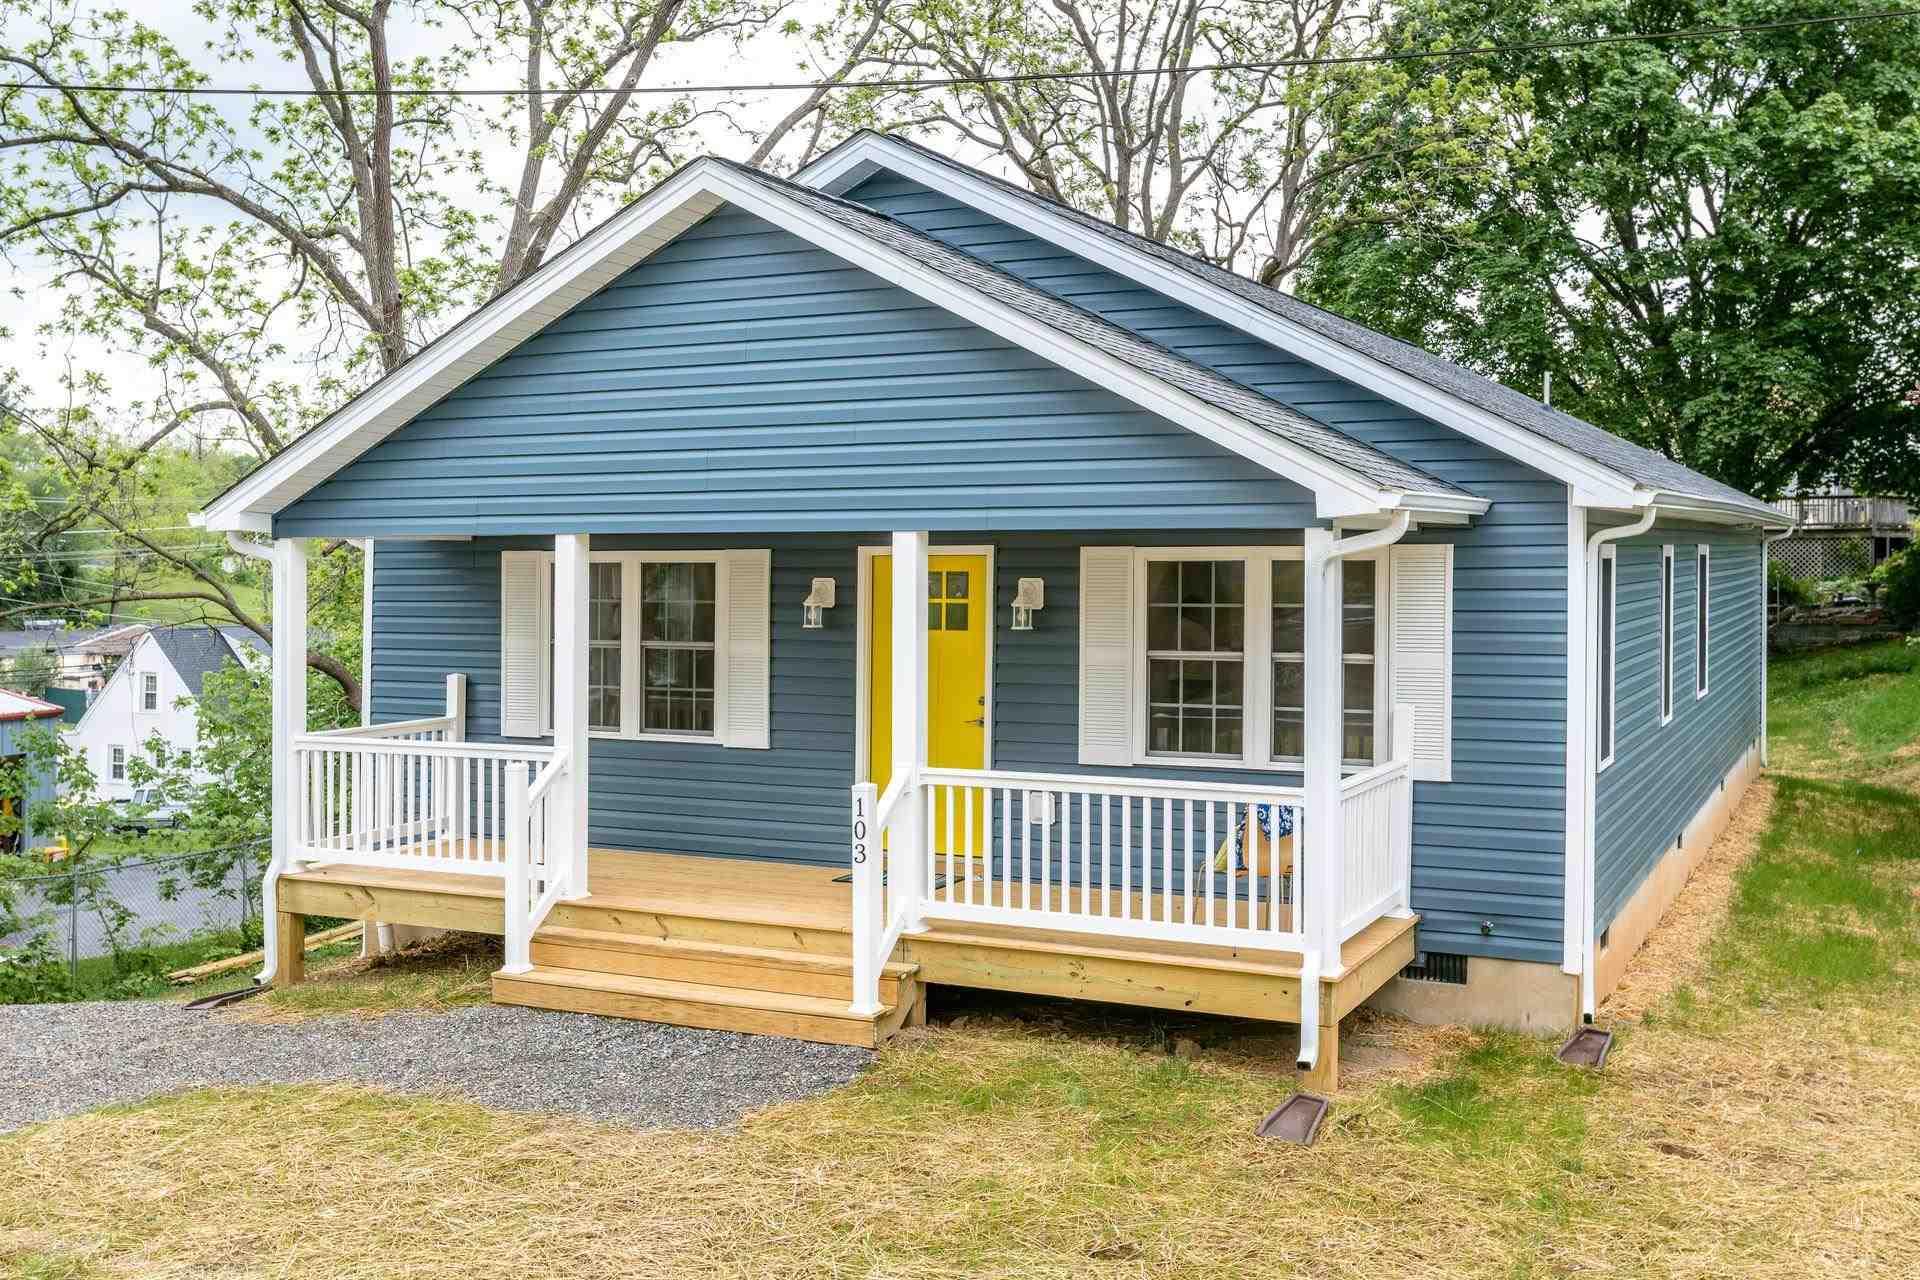 $258,000 - 3Br/3Ba -  for Sale in Bcmm & Lc, Waynesboro